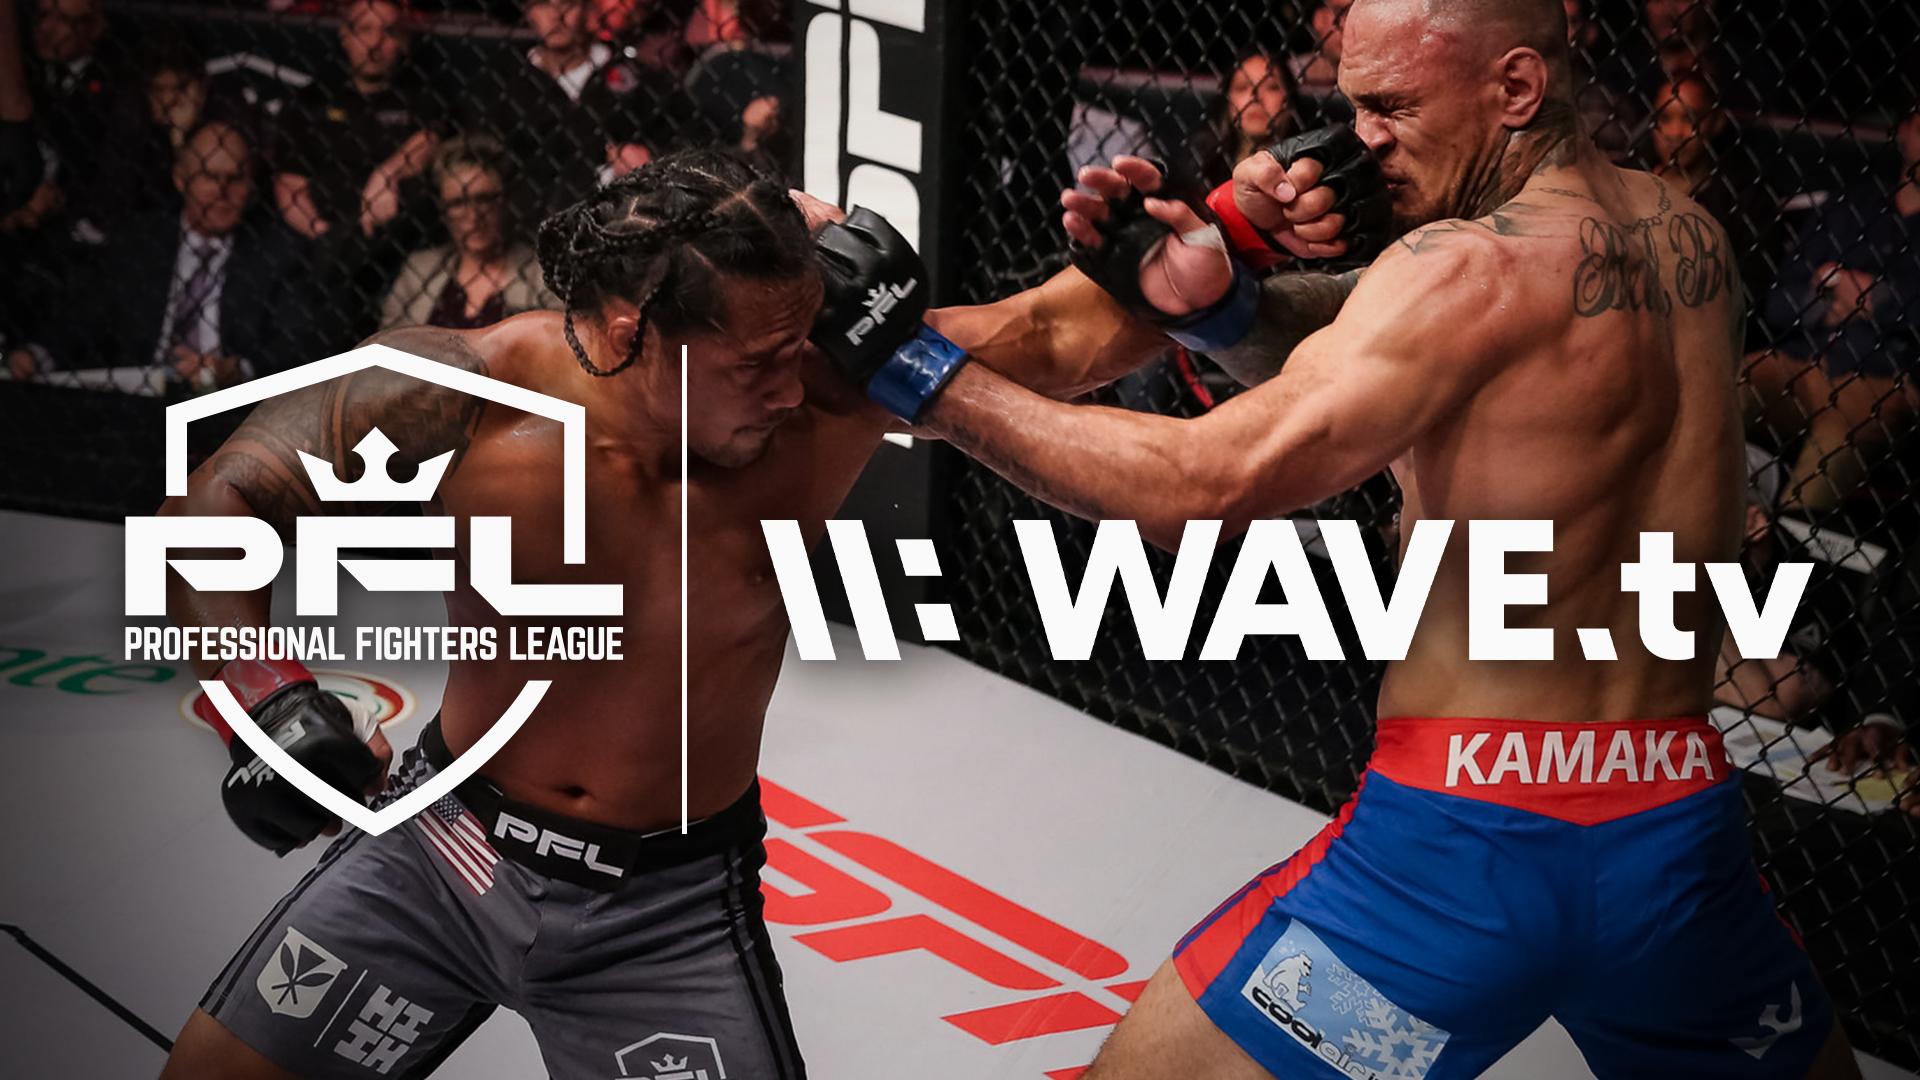 PFL STRENGTHENS WAVE.TV'S MMA PORTFOLIO THROUGH LANDMARK CONTENT AND DISTRIBUTION PARTNERSHIP